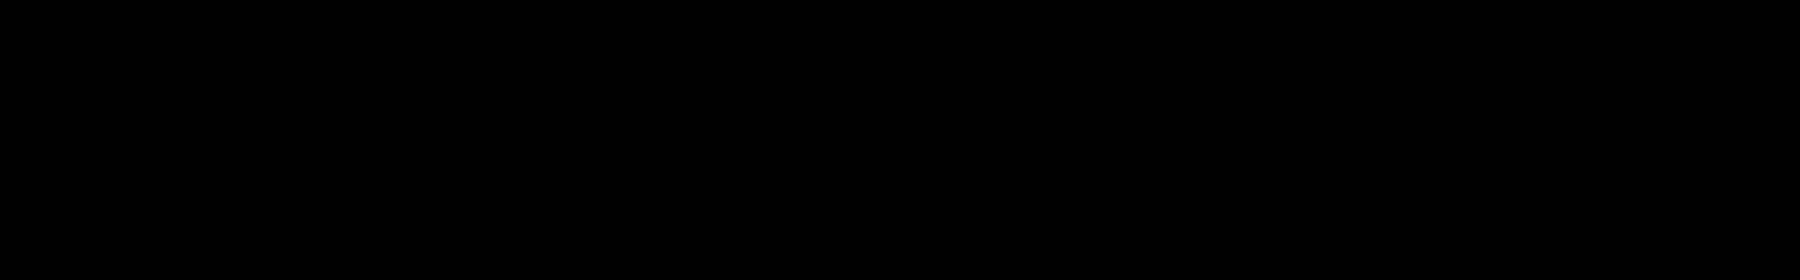 EDM Midi Vol 1 audio waveform